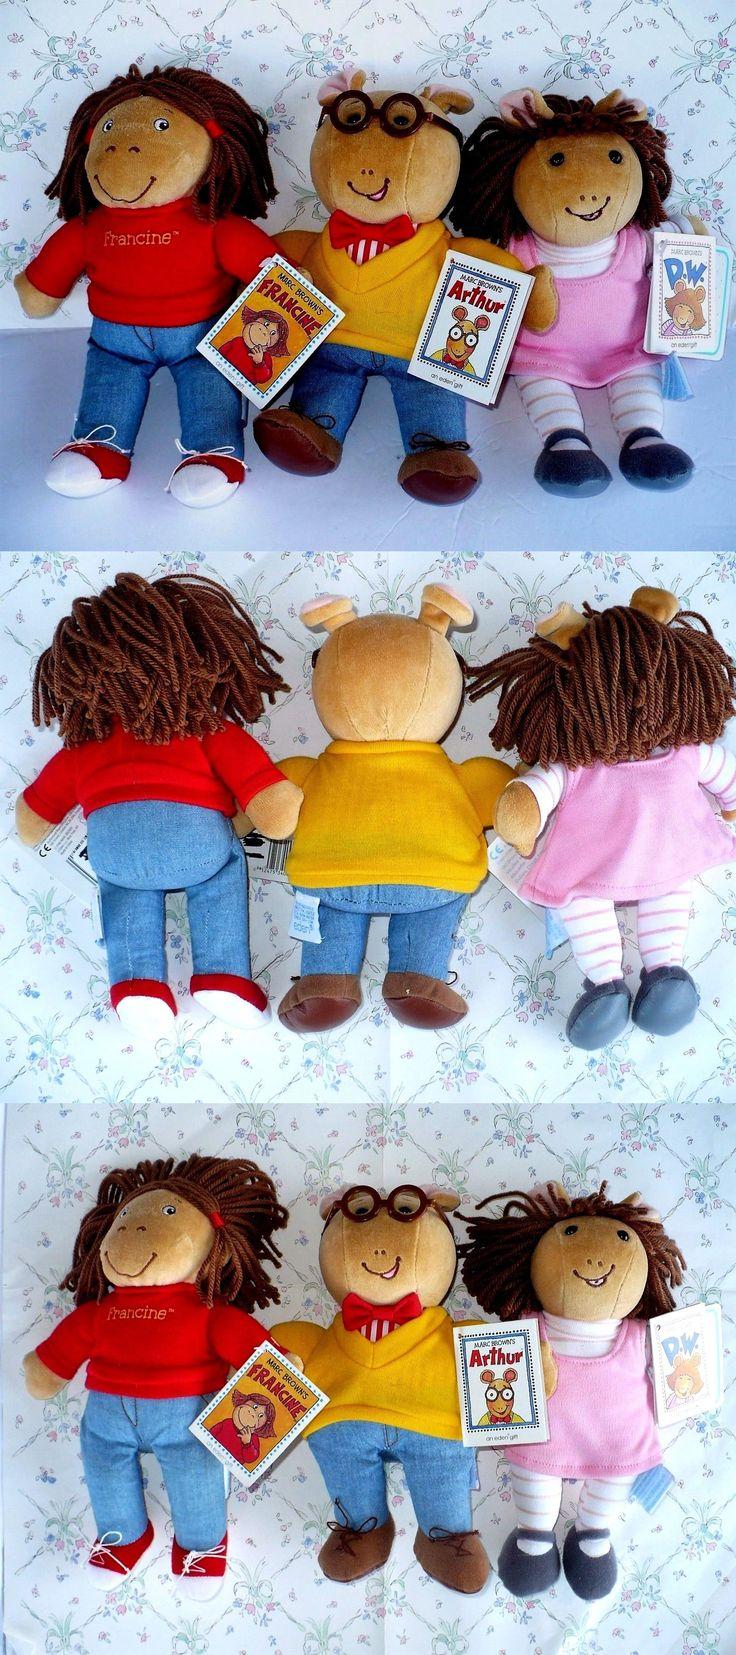 Arthur 20900: Eden 1998 Marc Brown S Arthur D.W. Francine 10 Plush Dolls Pbs Kids Nwt -> BUY IT NOW ONLY: $31.99 on eBay!